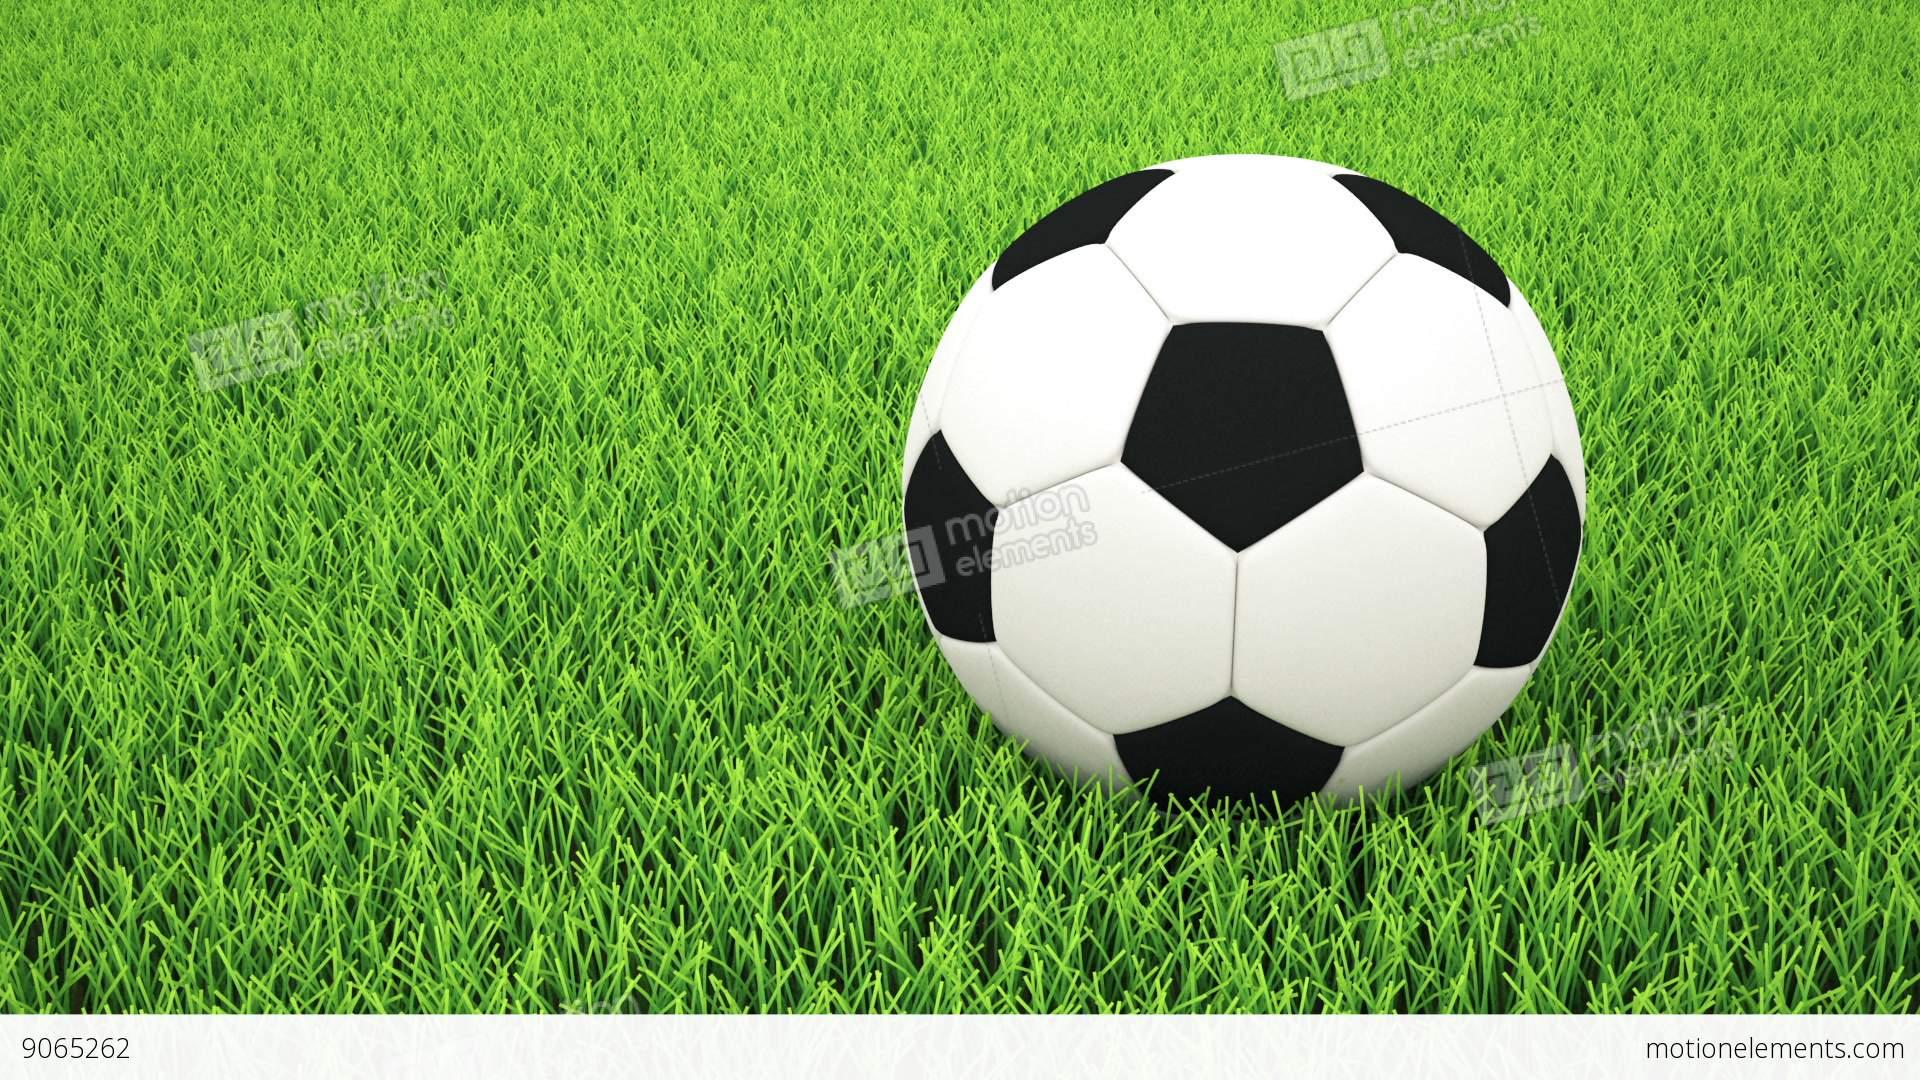 Deportes Pelotas Fondo Grunge: Panning To Soccer Ball On Grass Stock Animation